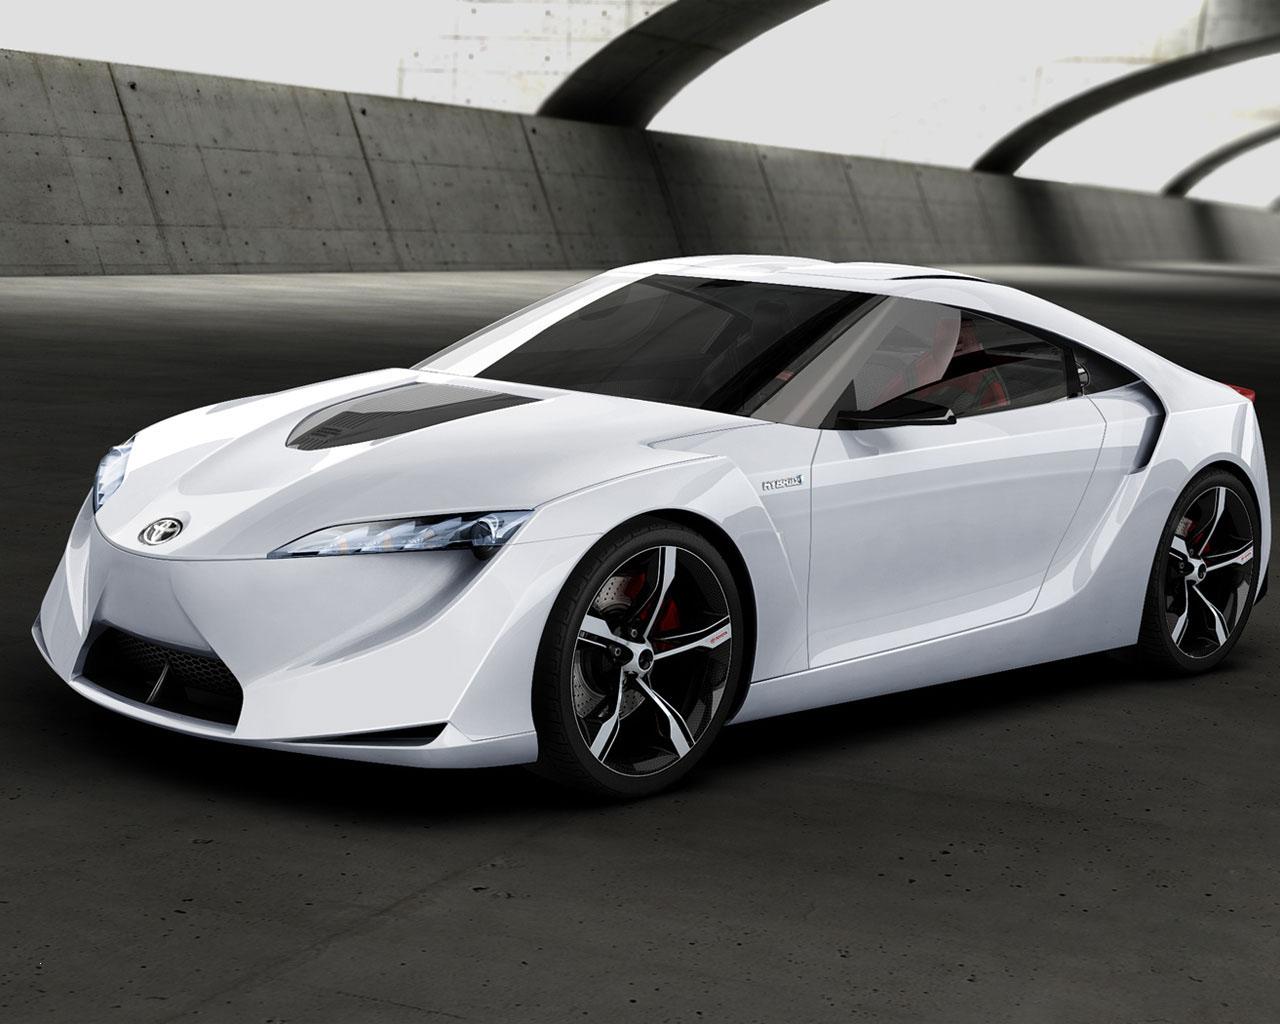 Futuristic Toyota FT-HS Hybrid Sports Concept Car